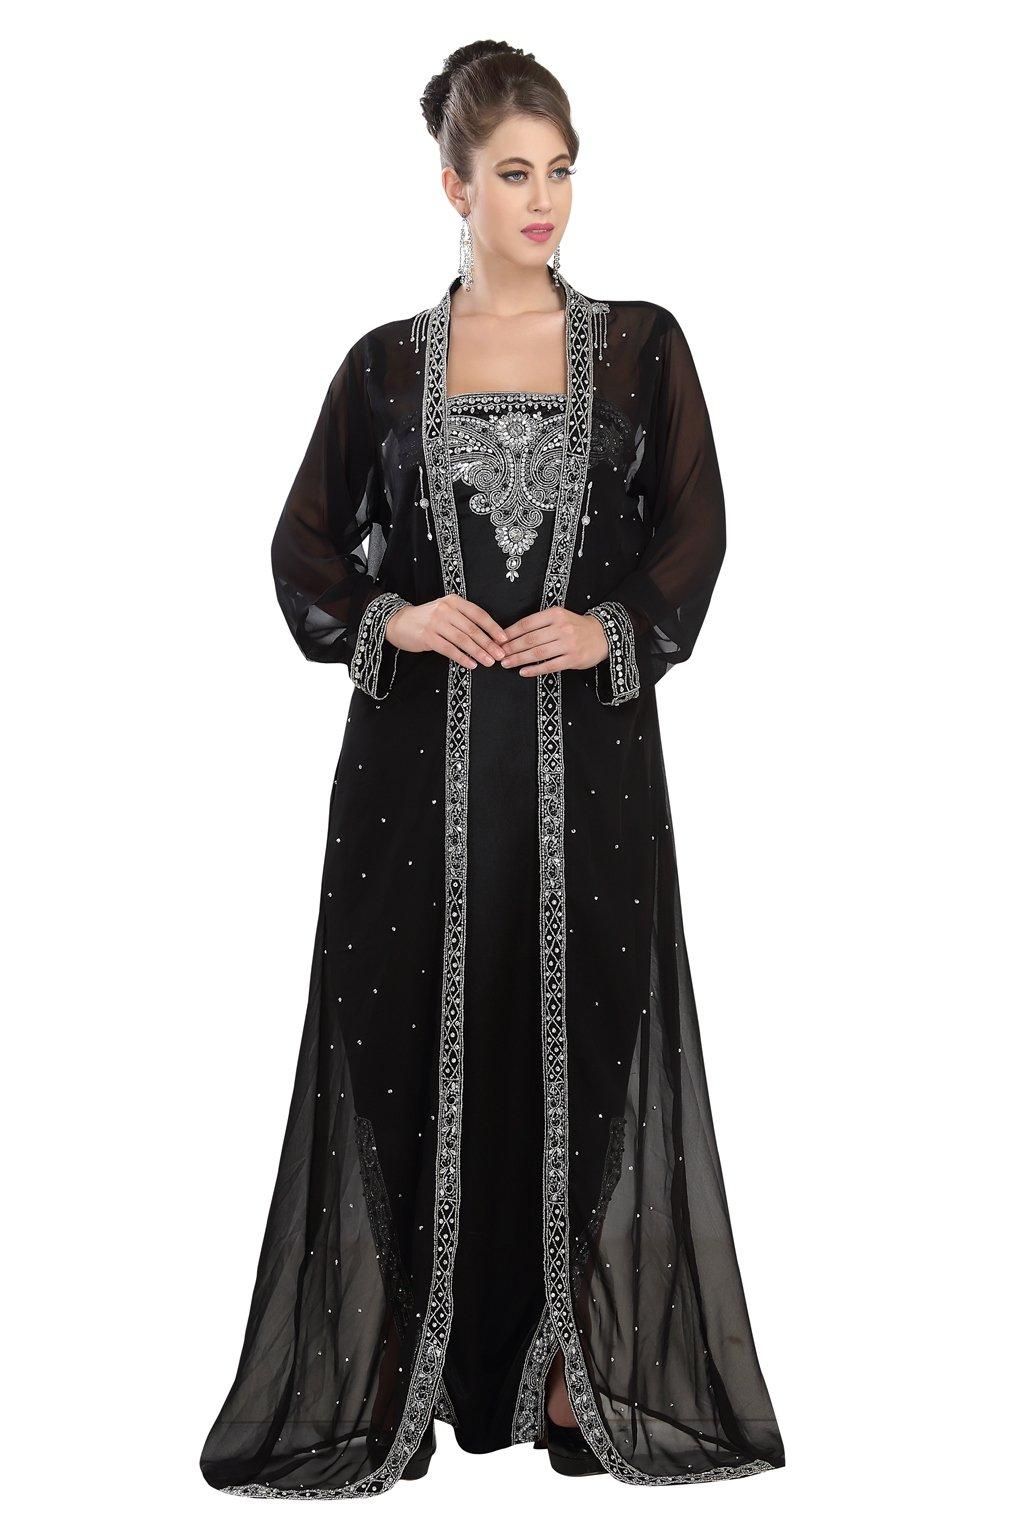 a1494d4cfa Get Quotations · Modern Stylish Party Wear Moroccan Kaftan Dress Unique  Design By Maxim Creation 5528